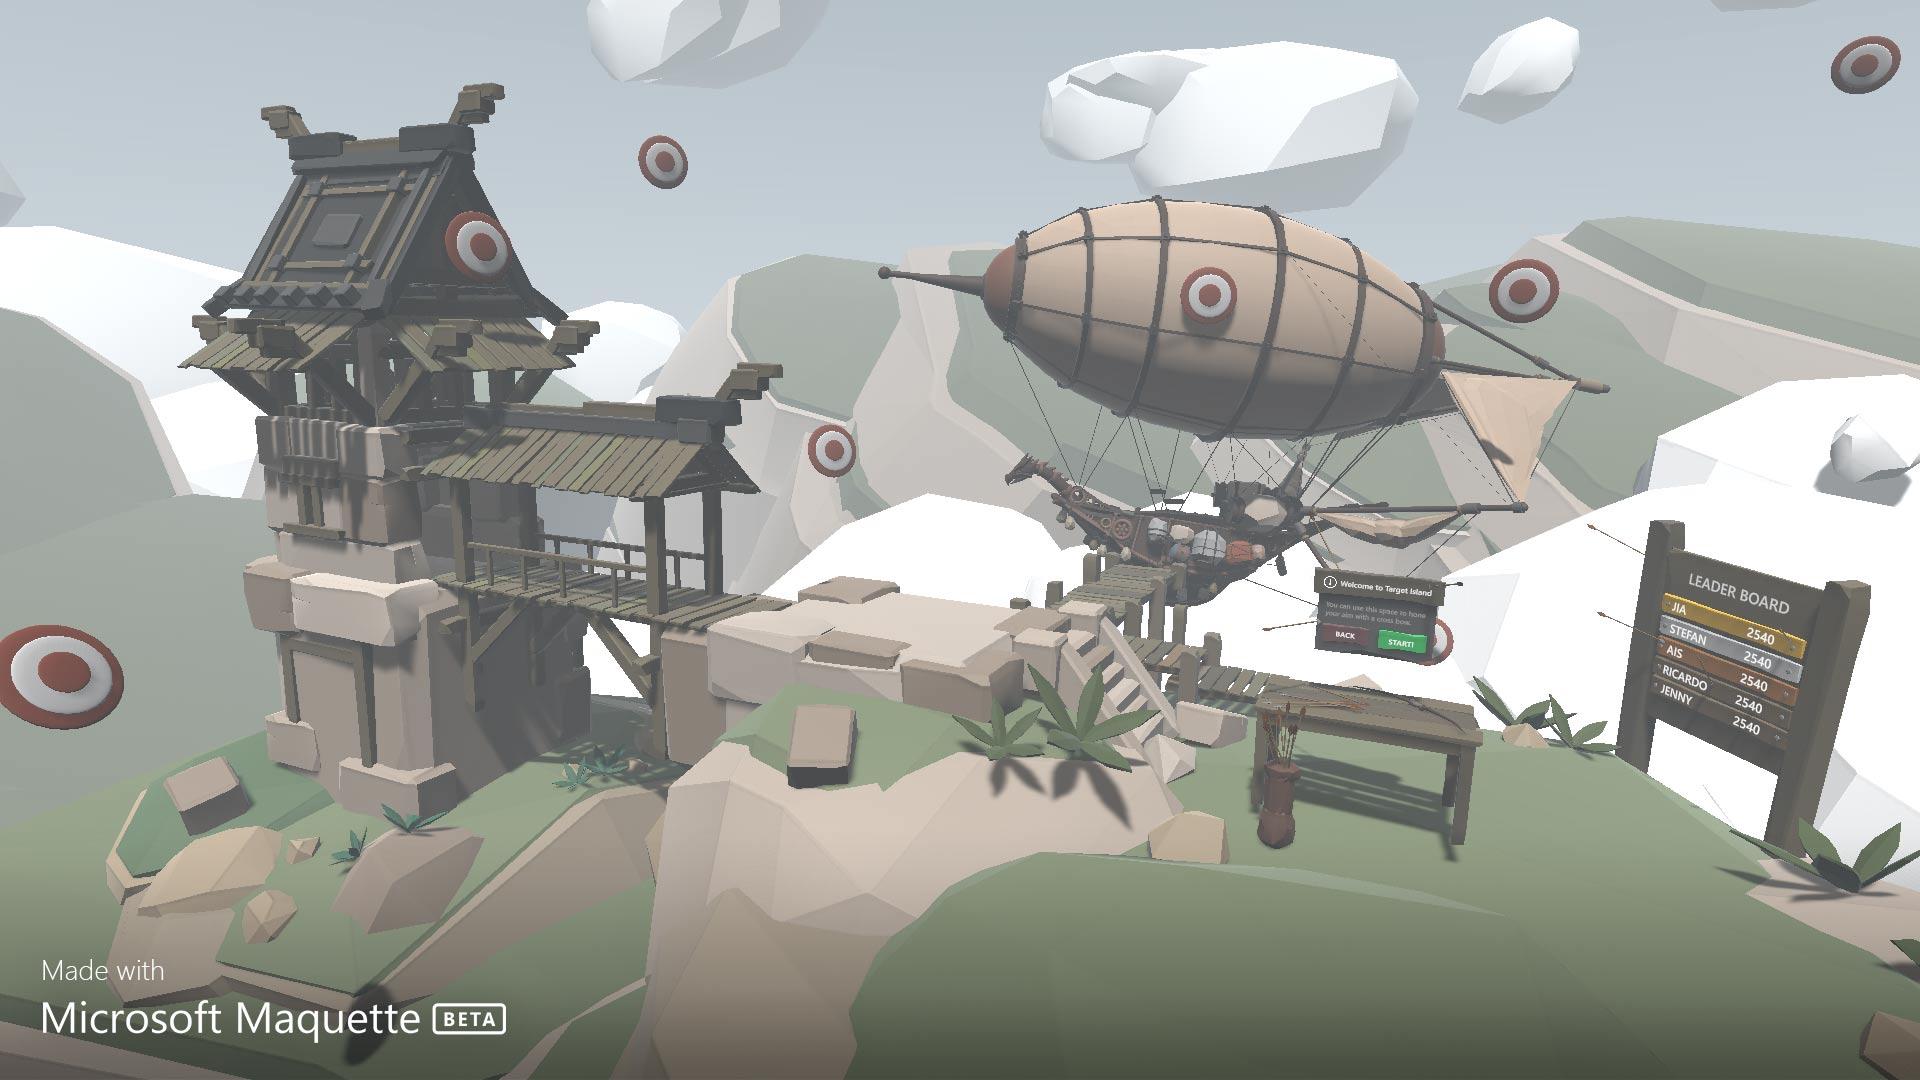 maquette game screenshot wallpaper 73686